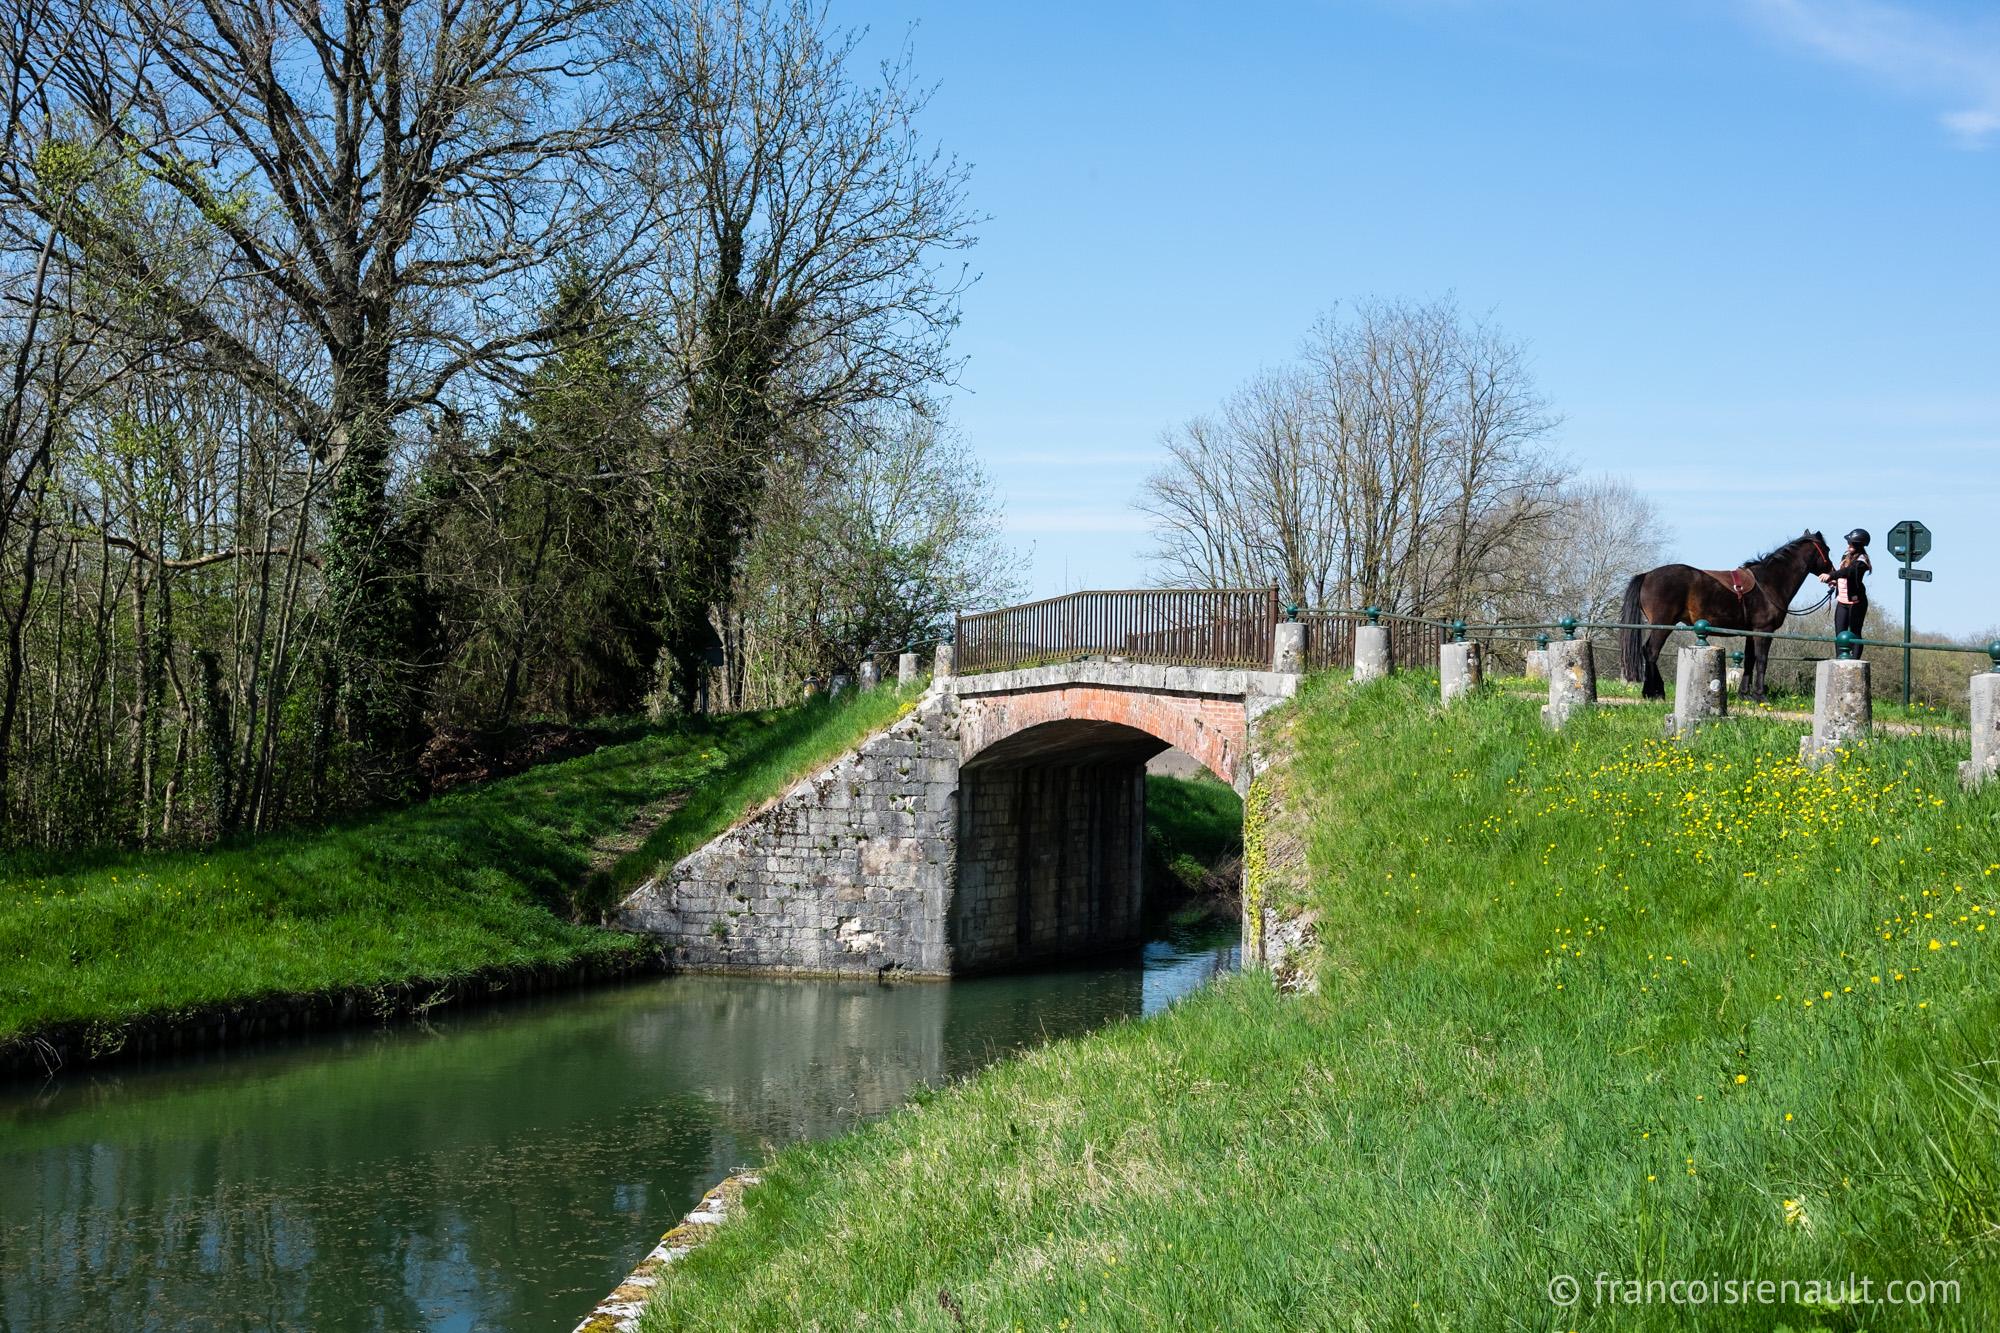 Canal-Nivernais-Francois-Renault-04